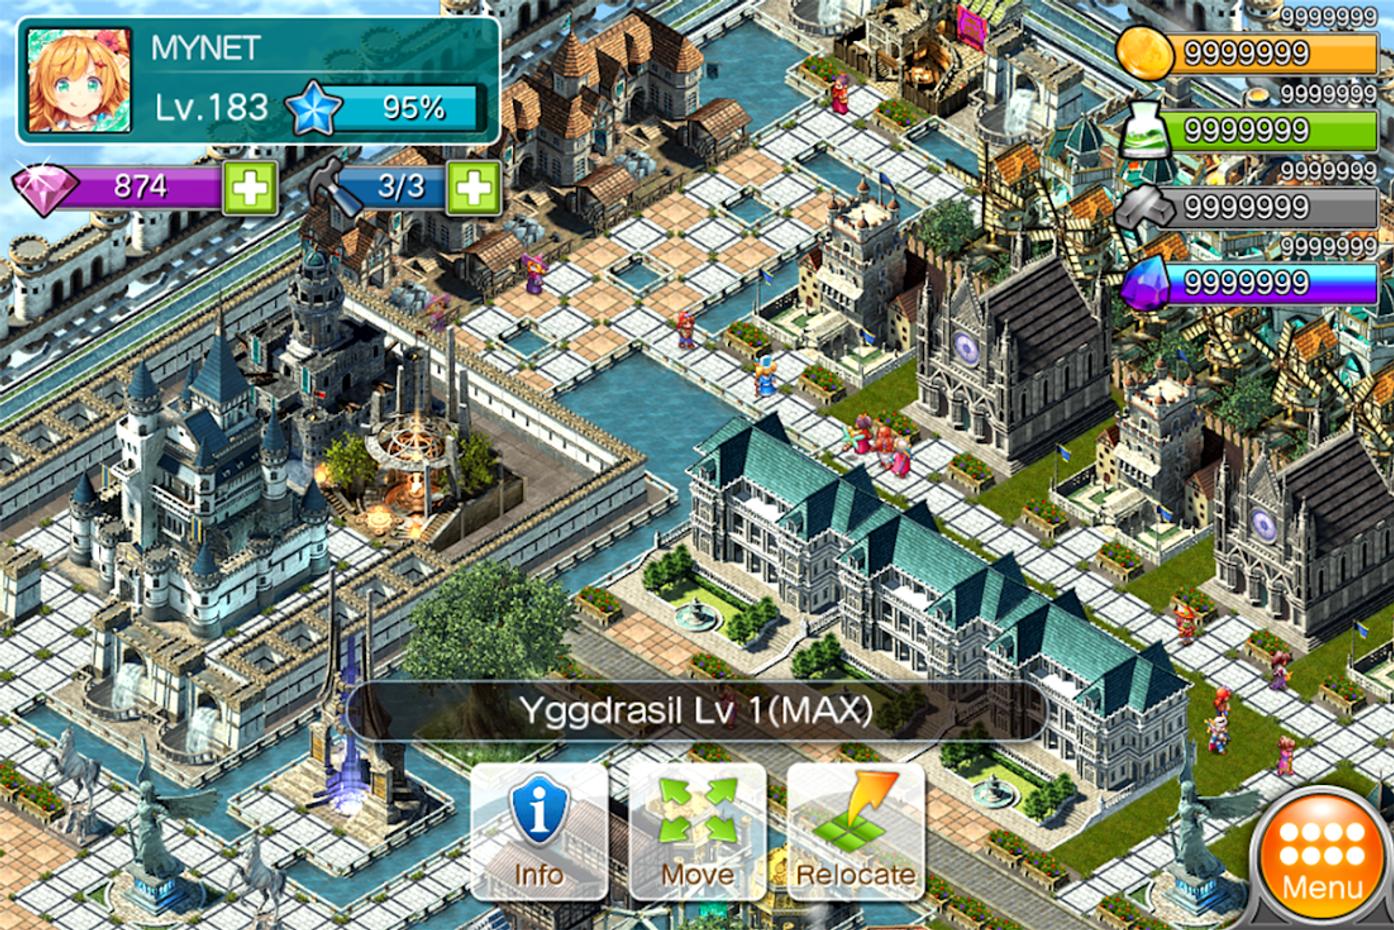 Screenshots - Valkyrie Crusade 【Anime-Style TCG x Builder Game】